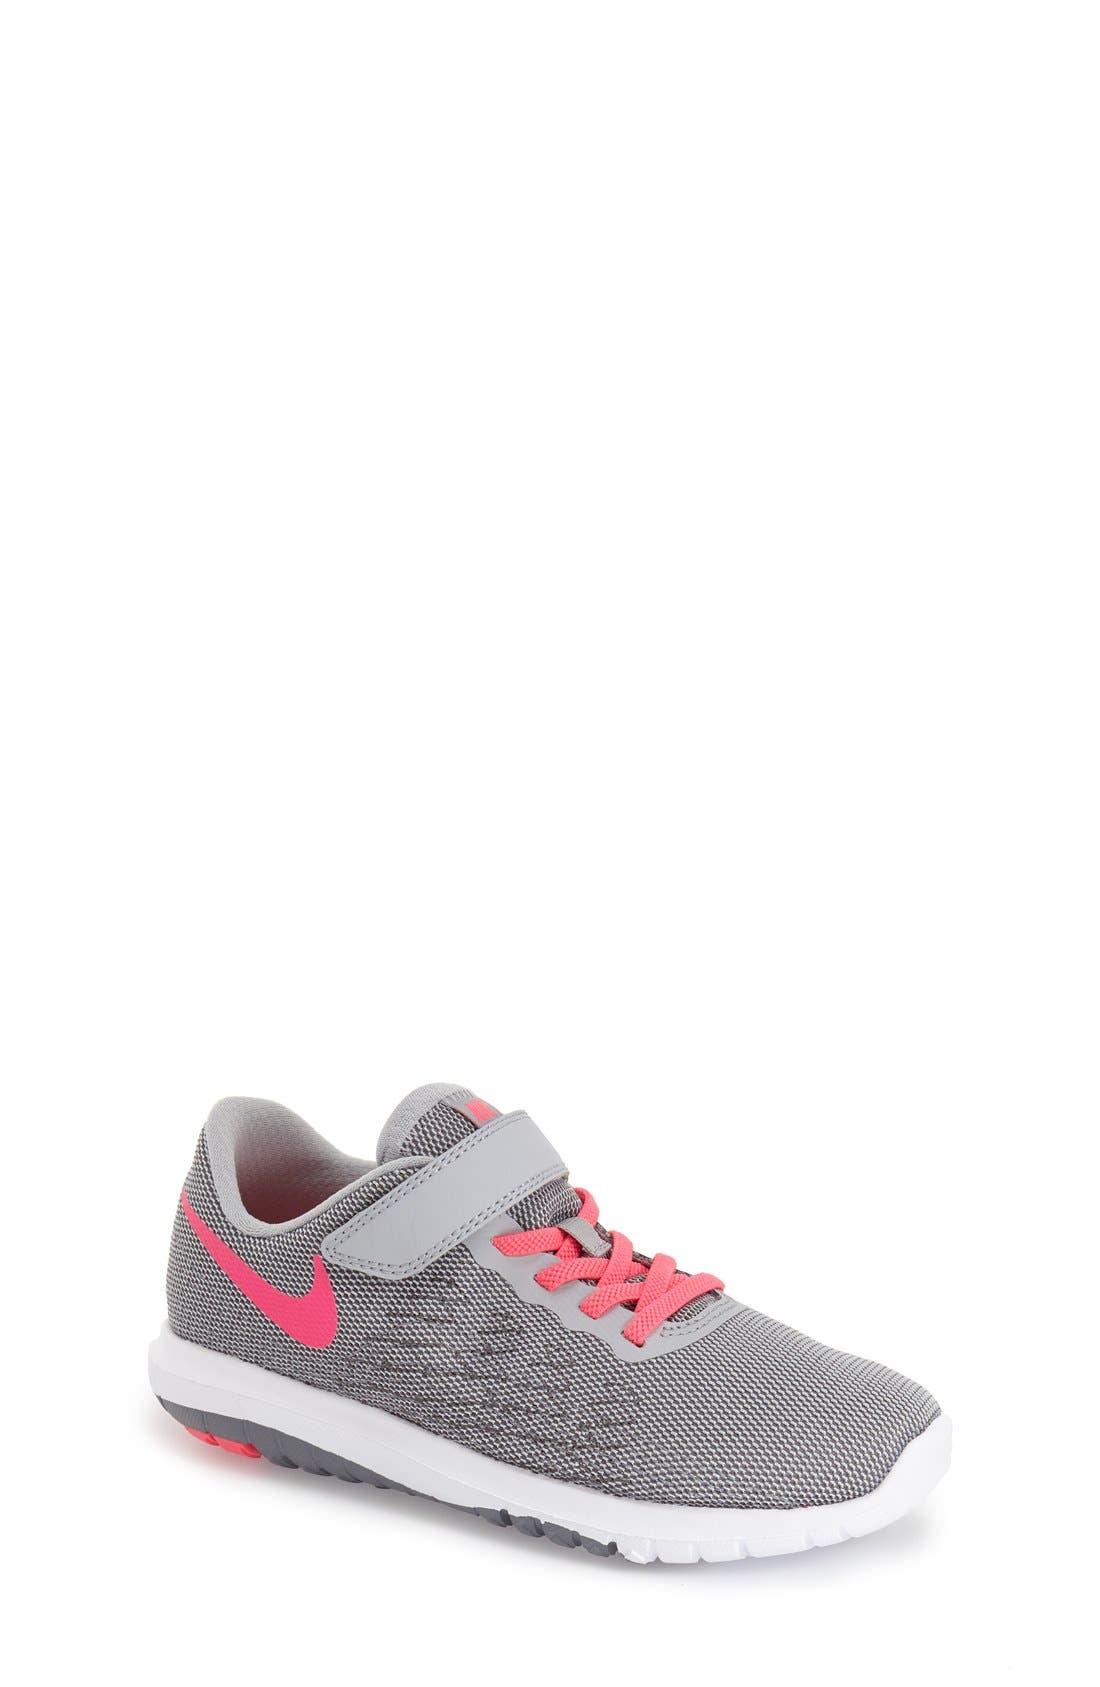 'Flex Fury 2' Athletic Shoe,                             Main thumbnail 1, color,                             020